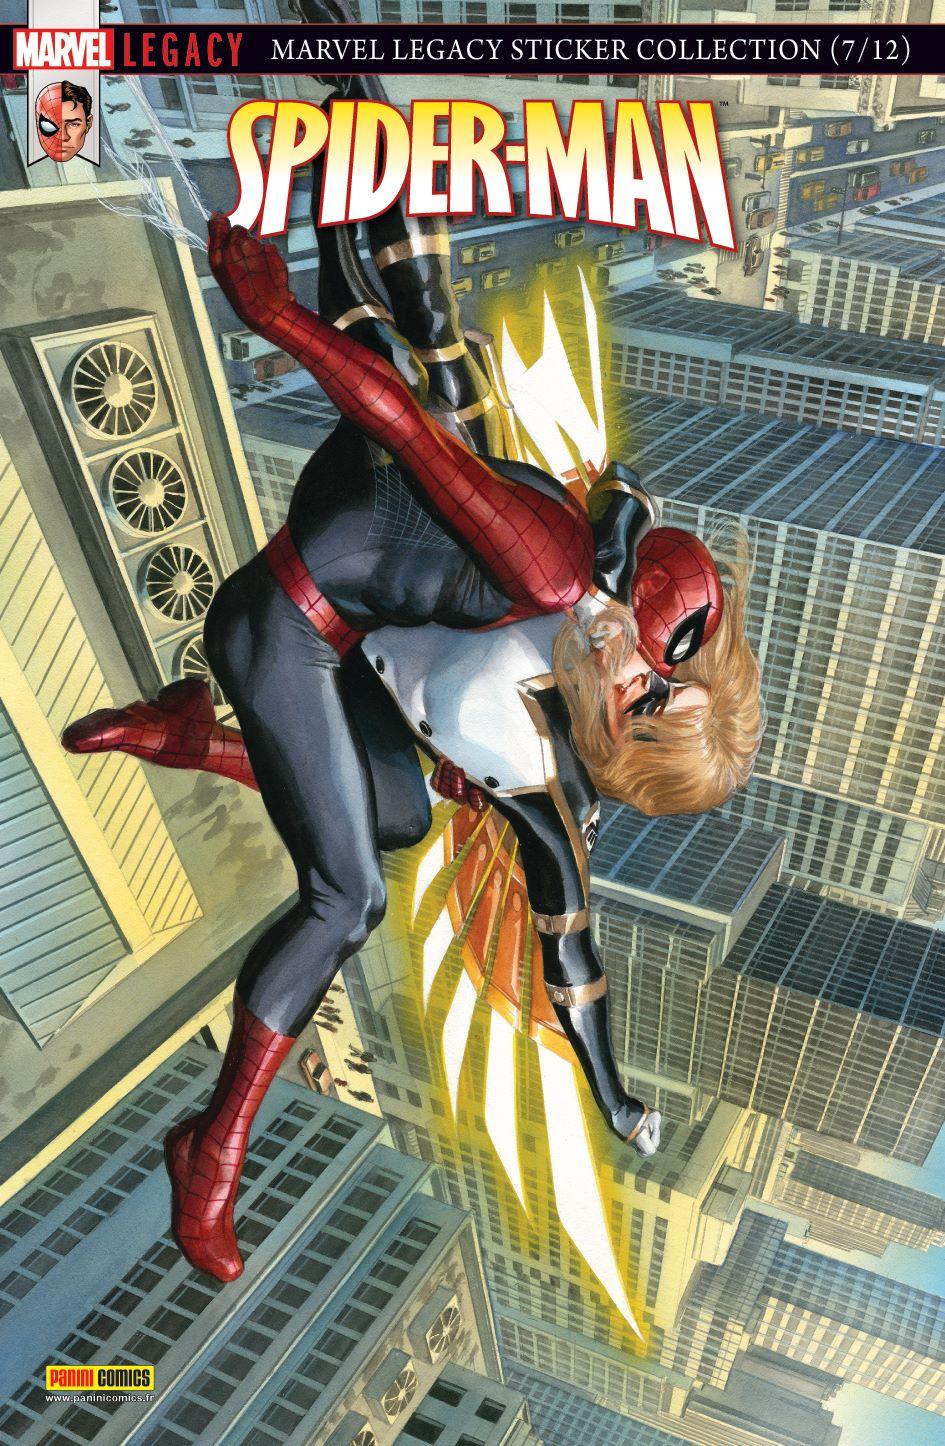 MARVEL LEGACY : SPIDER-MAN 2